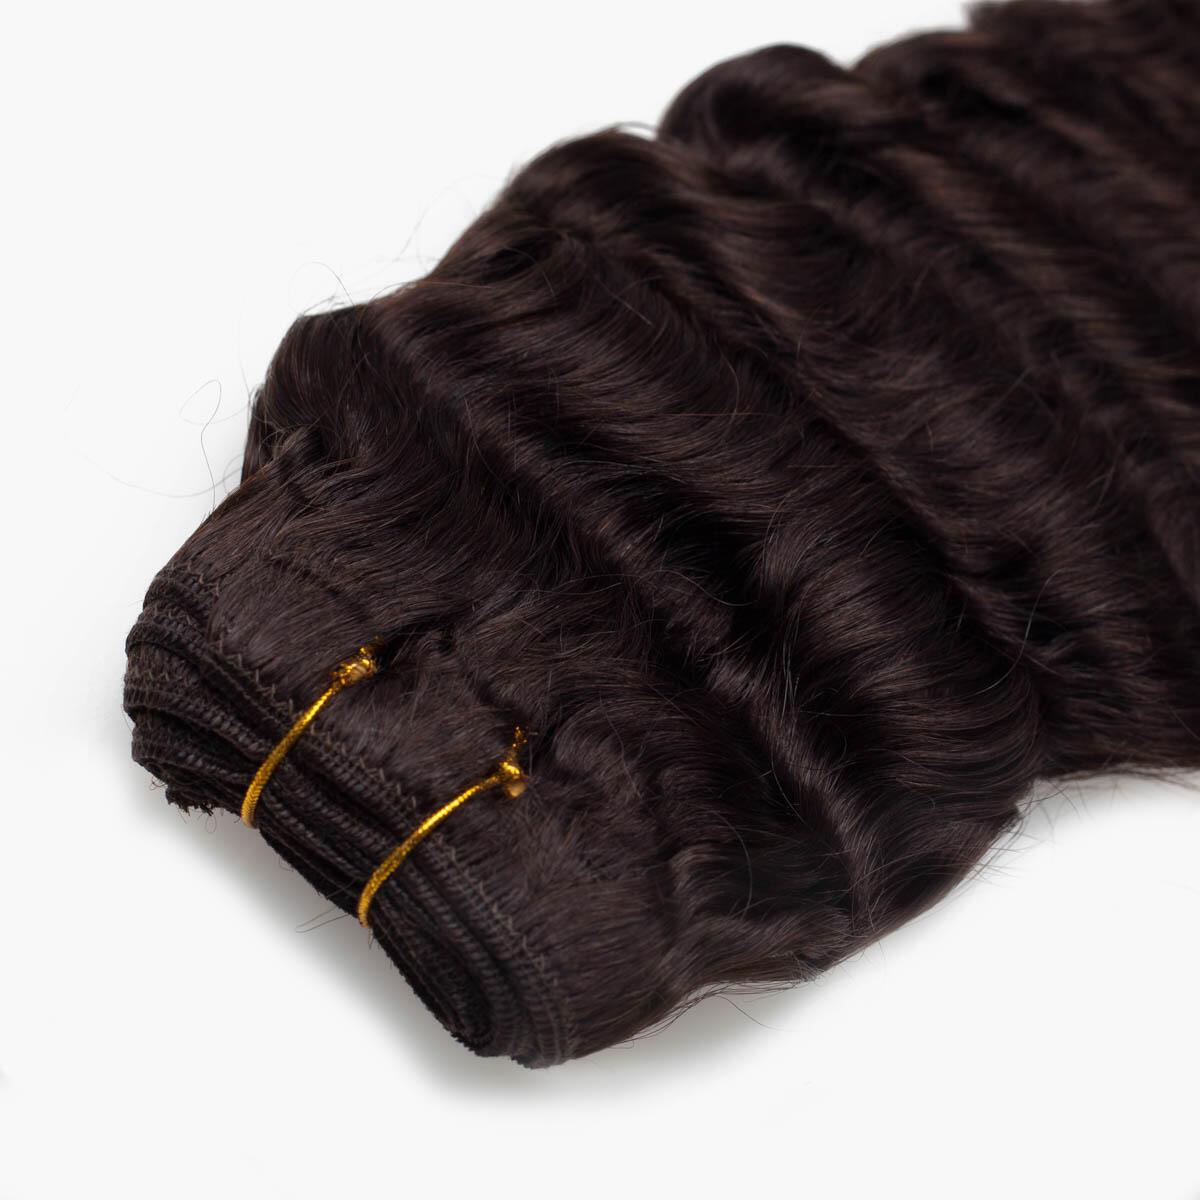 Hair Weft 2.3 Chocolate Brown 45 cm